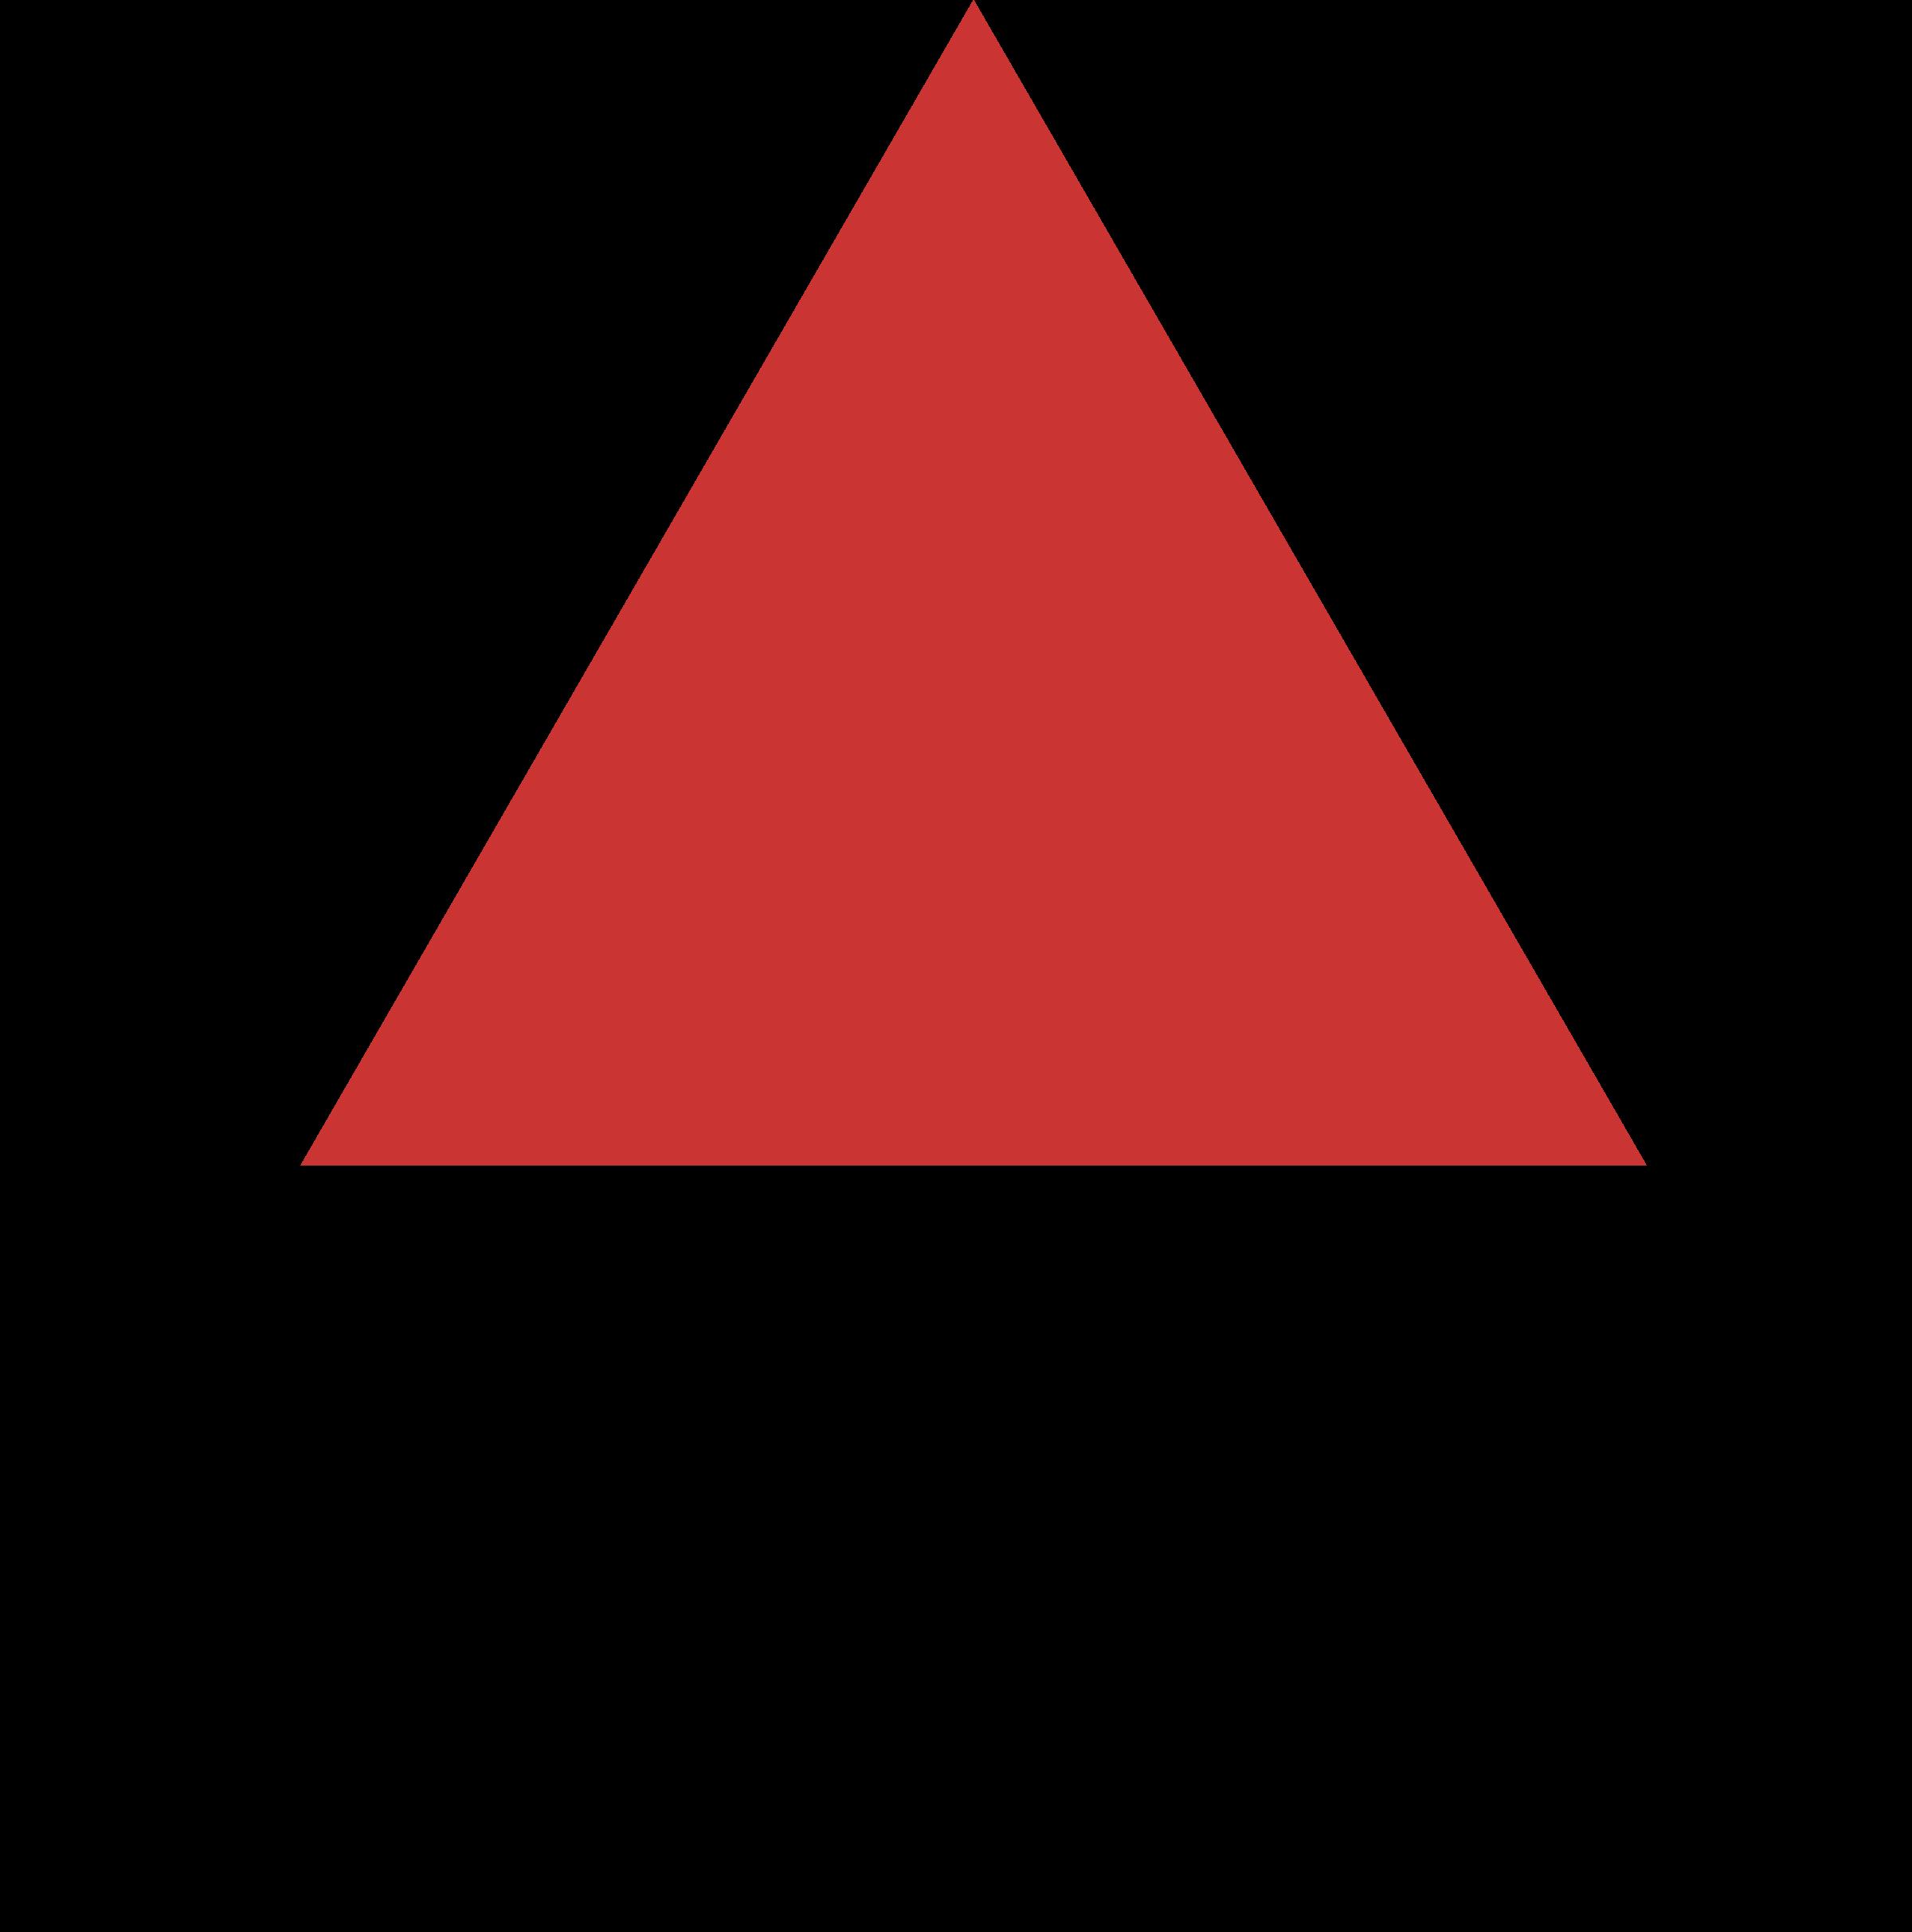 clipart library download Logo png transparent vector. Bass svg emblem